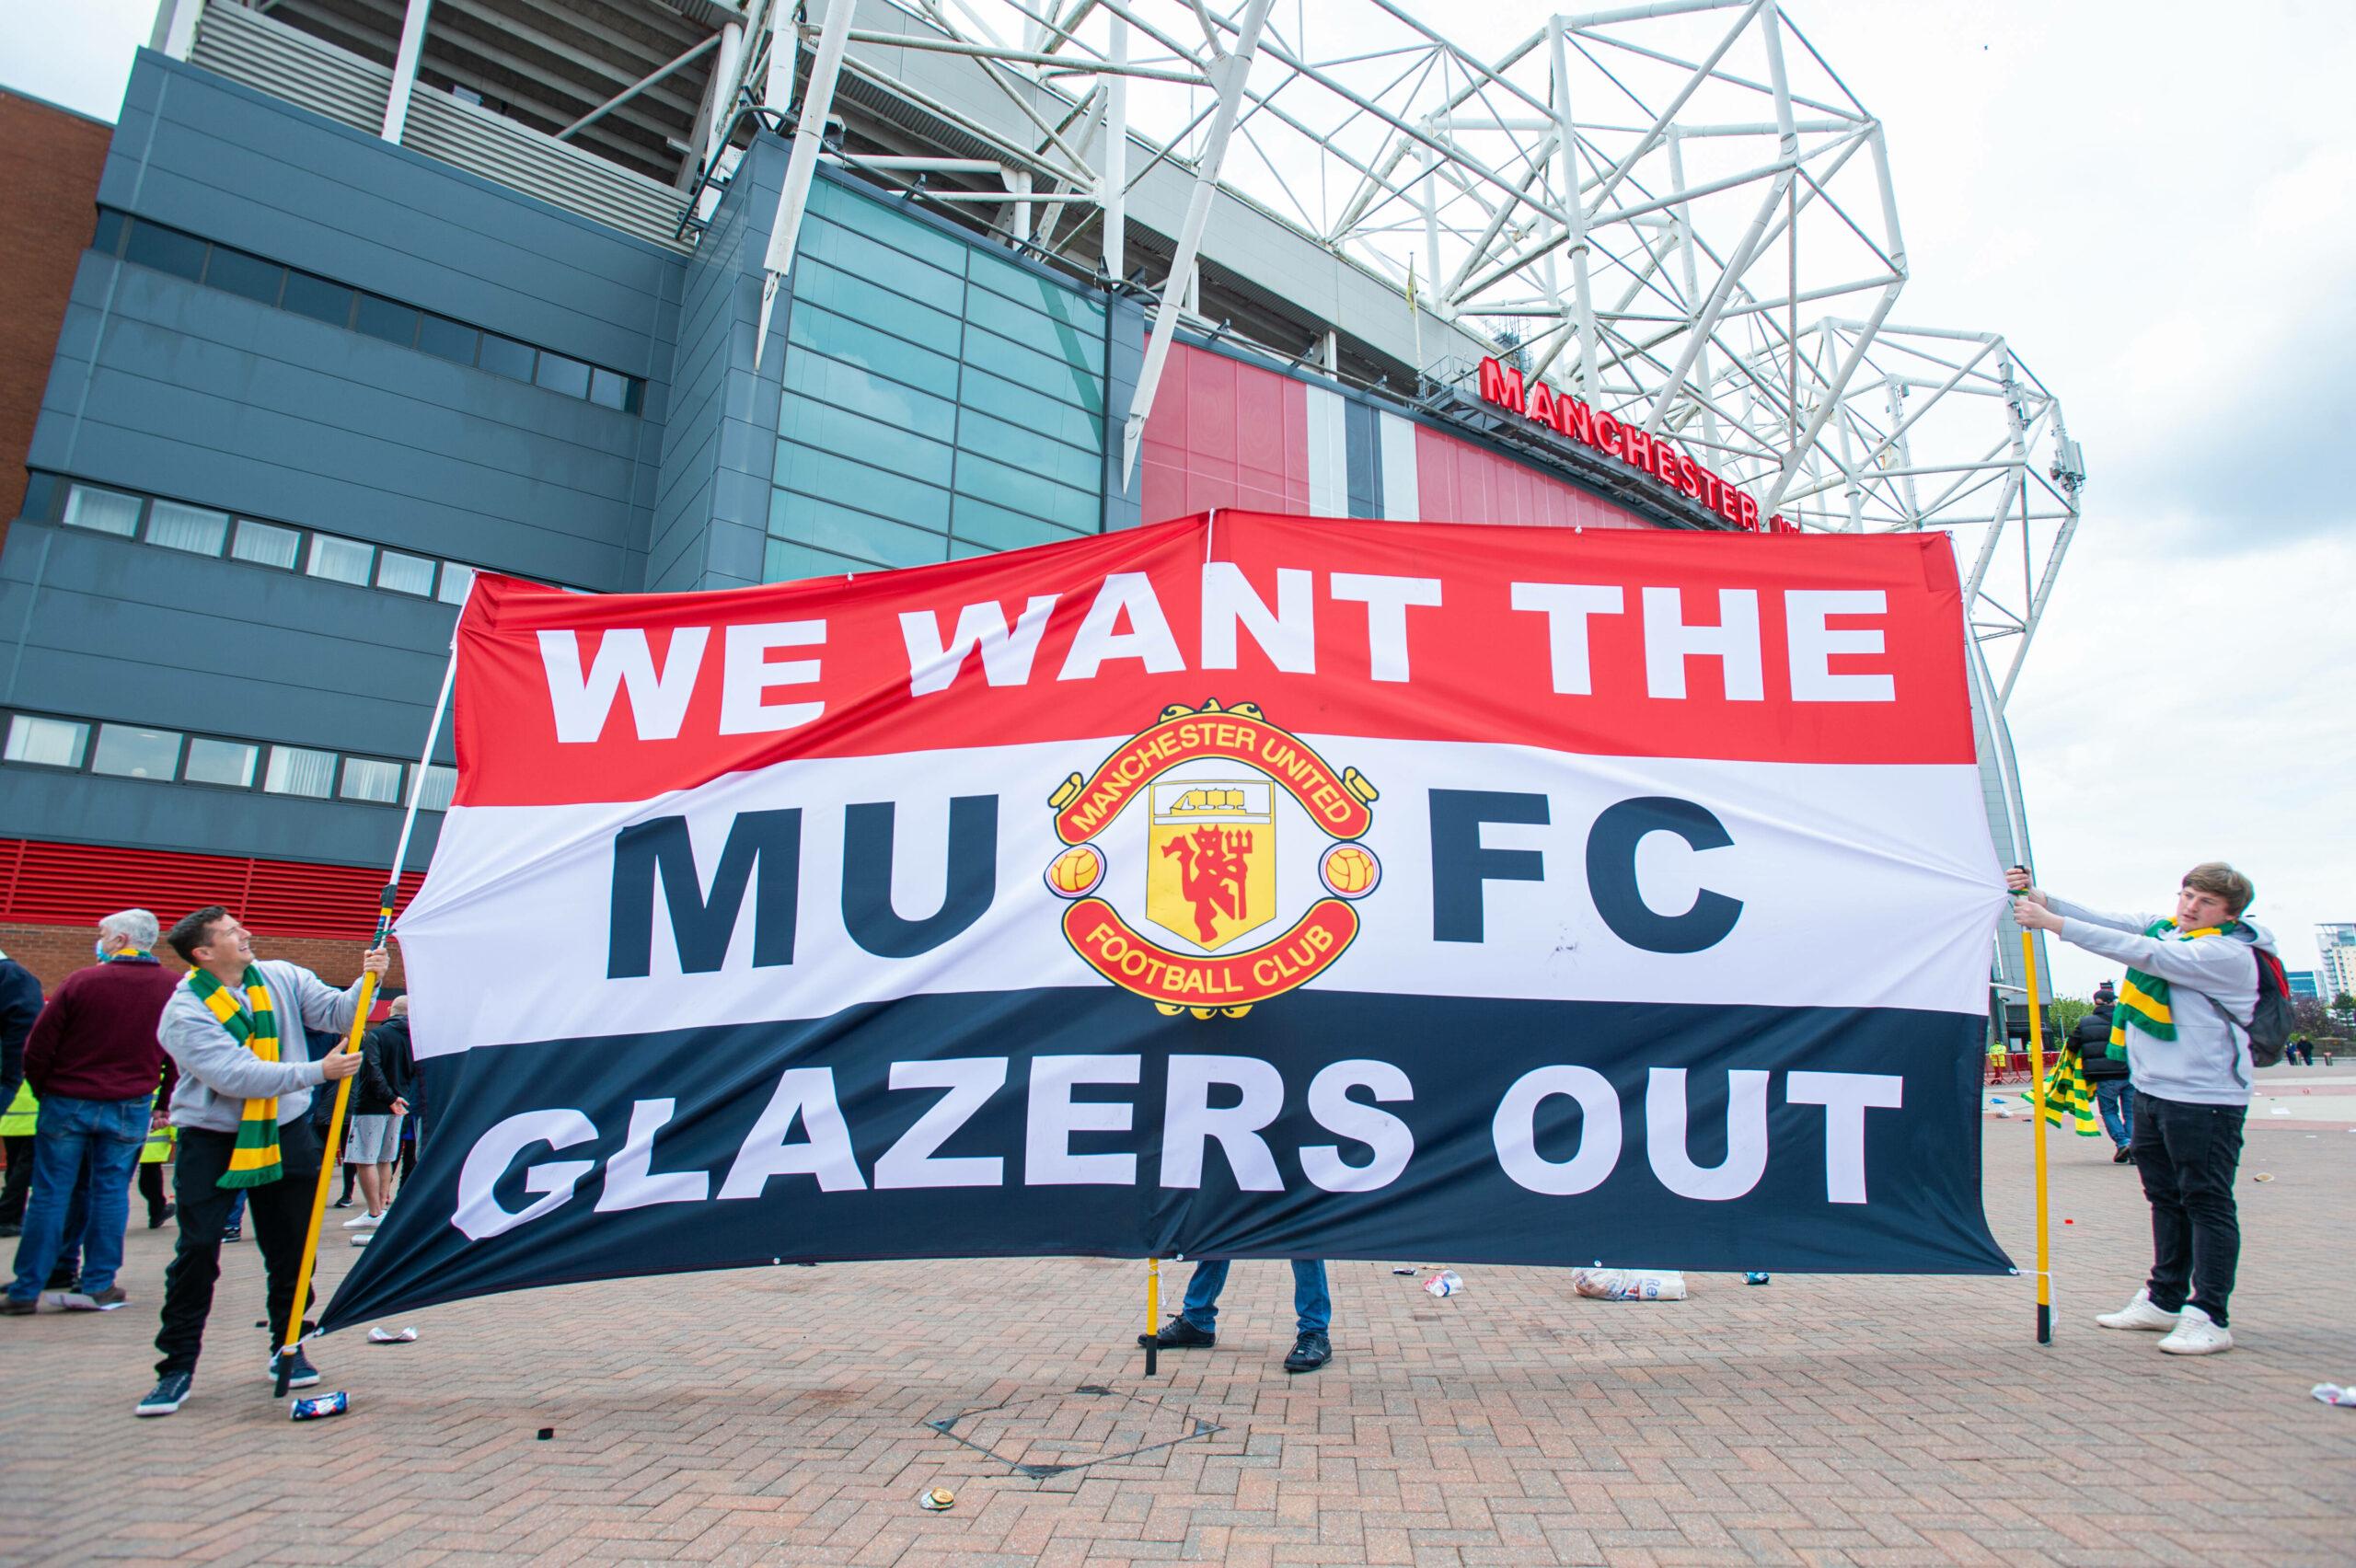 Manchester United Sponsor Glazer Fans